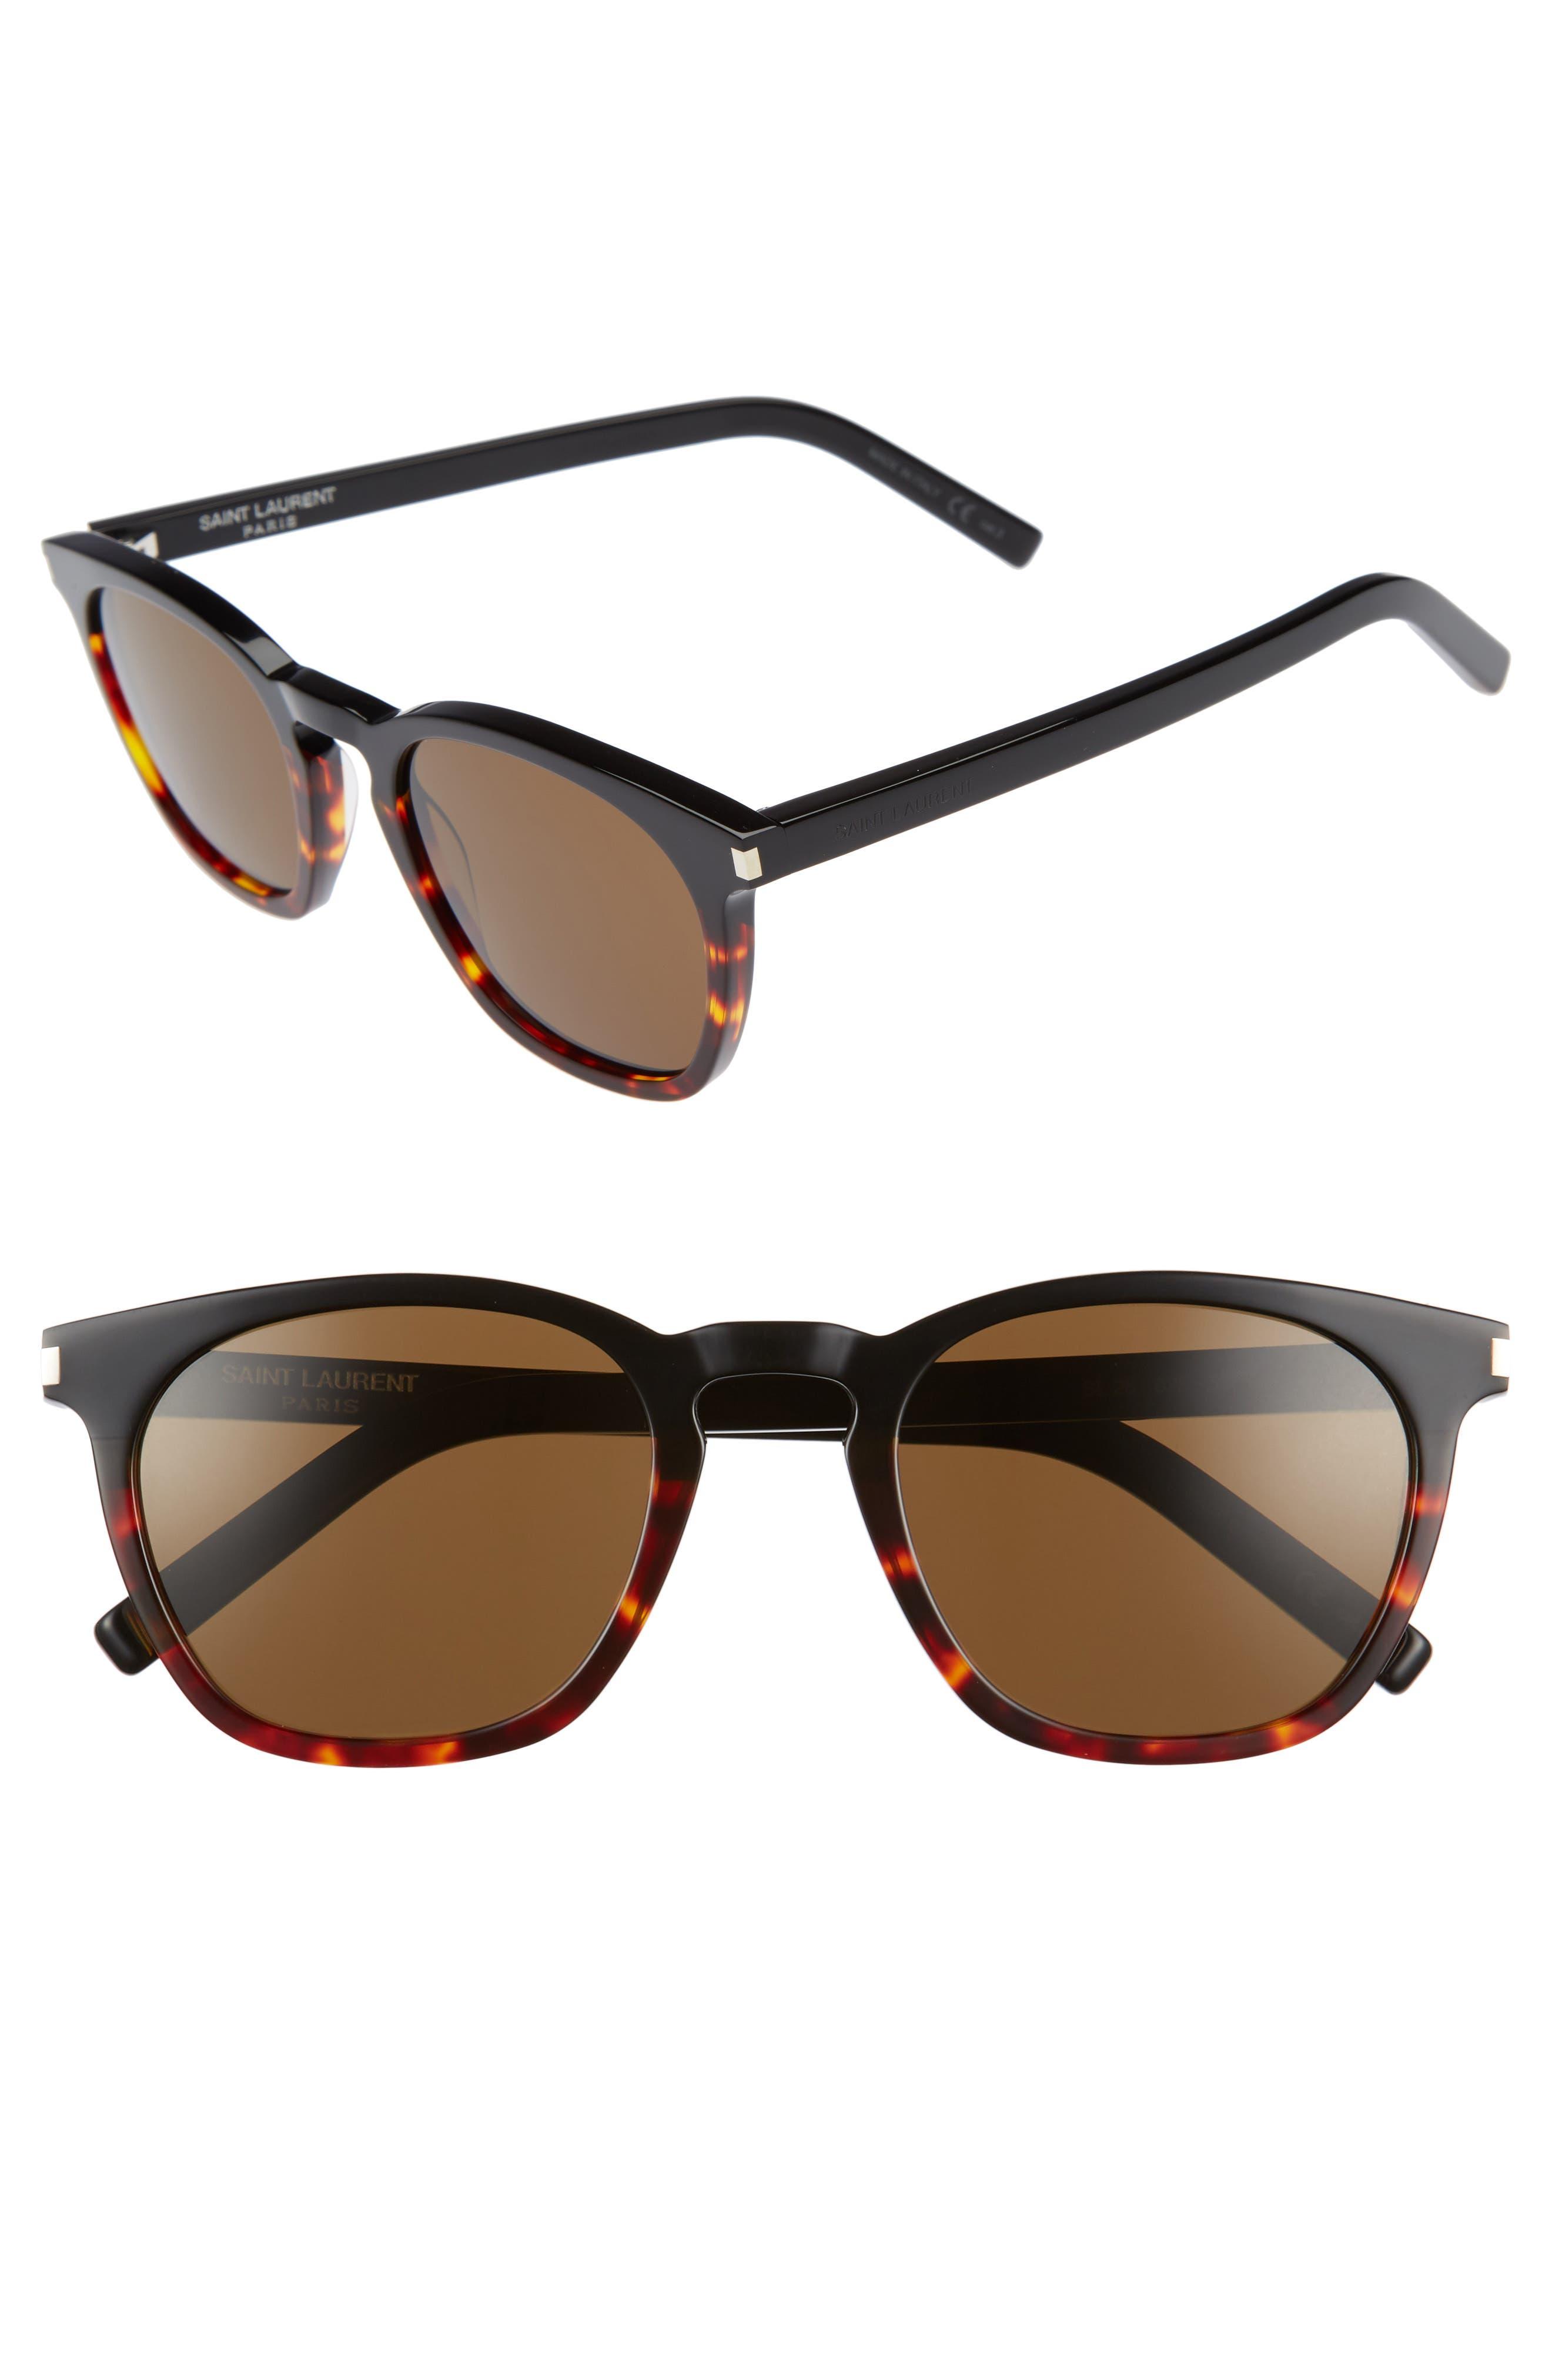 SL 28 51mm Keyhole Sunglasses,                         Main,                         color, Black